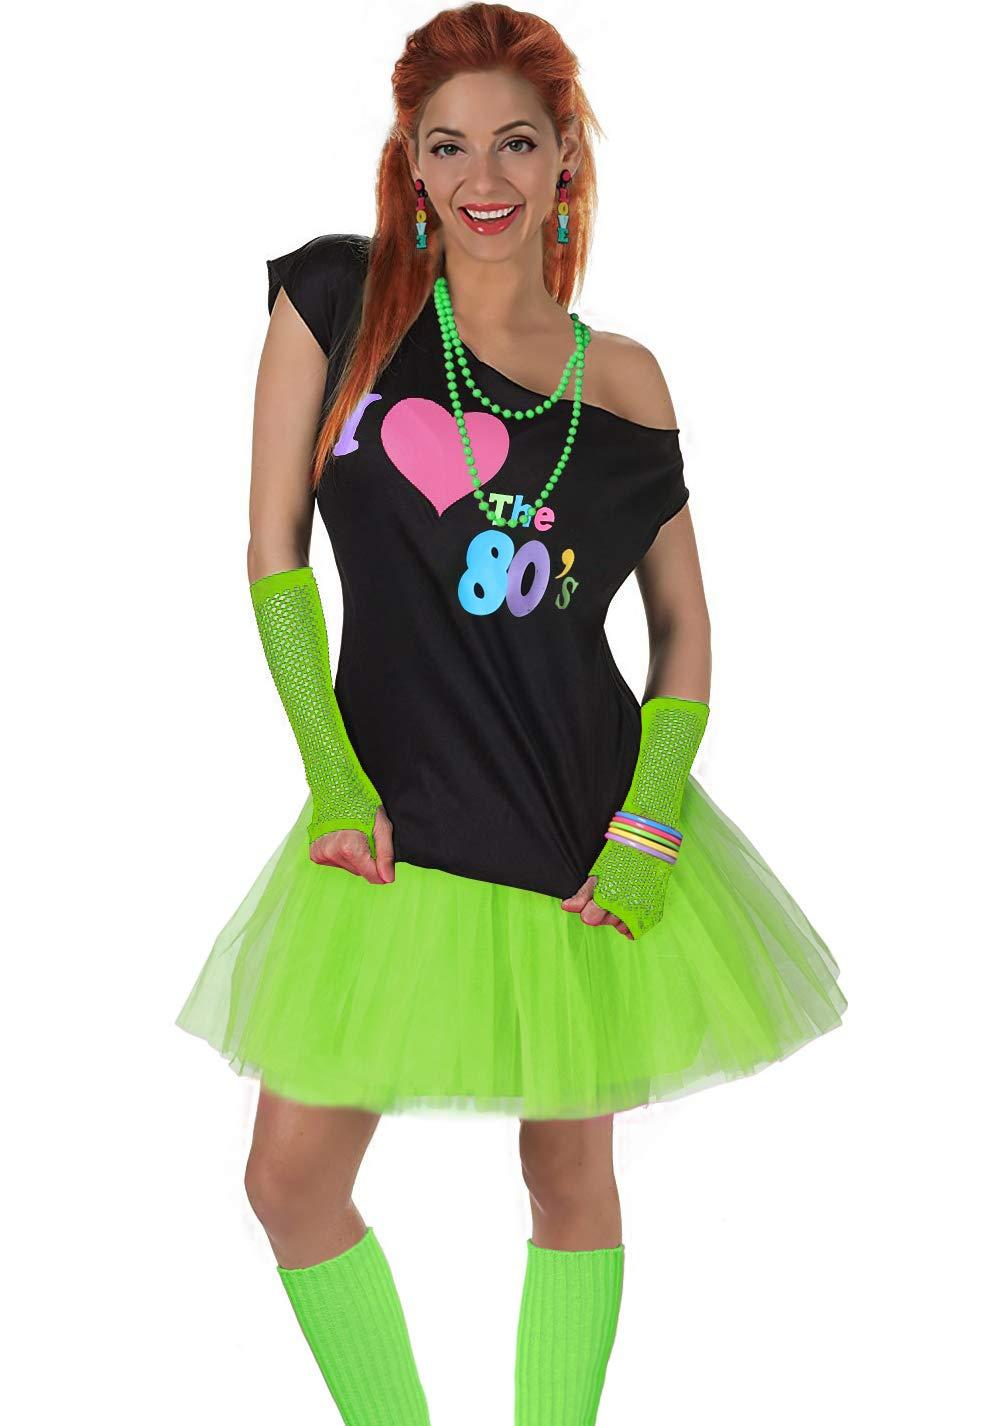 Rubies Costume Co D/éguisement Femme Tee-Shirt I Love the 80s Femme Ann/ées 80